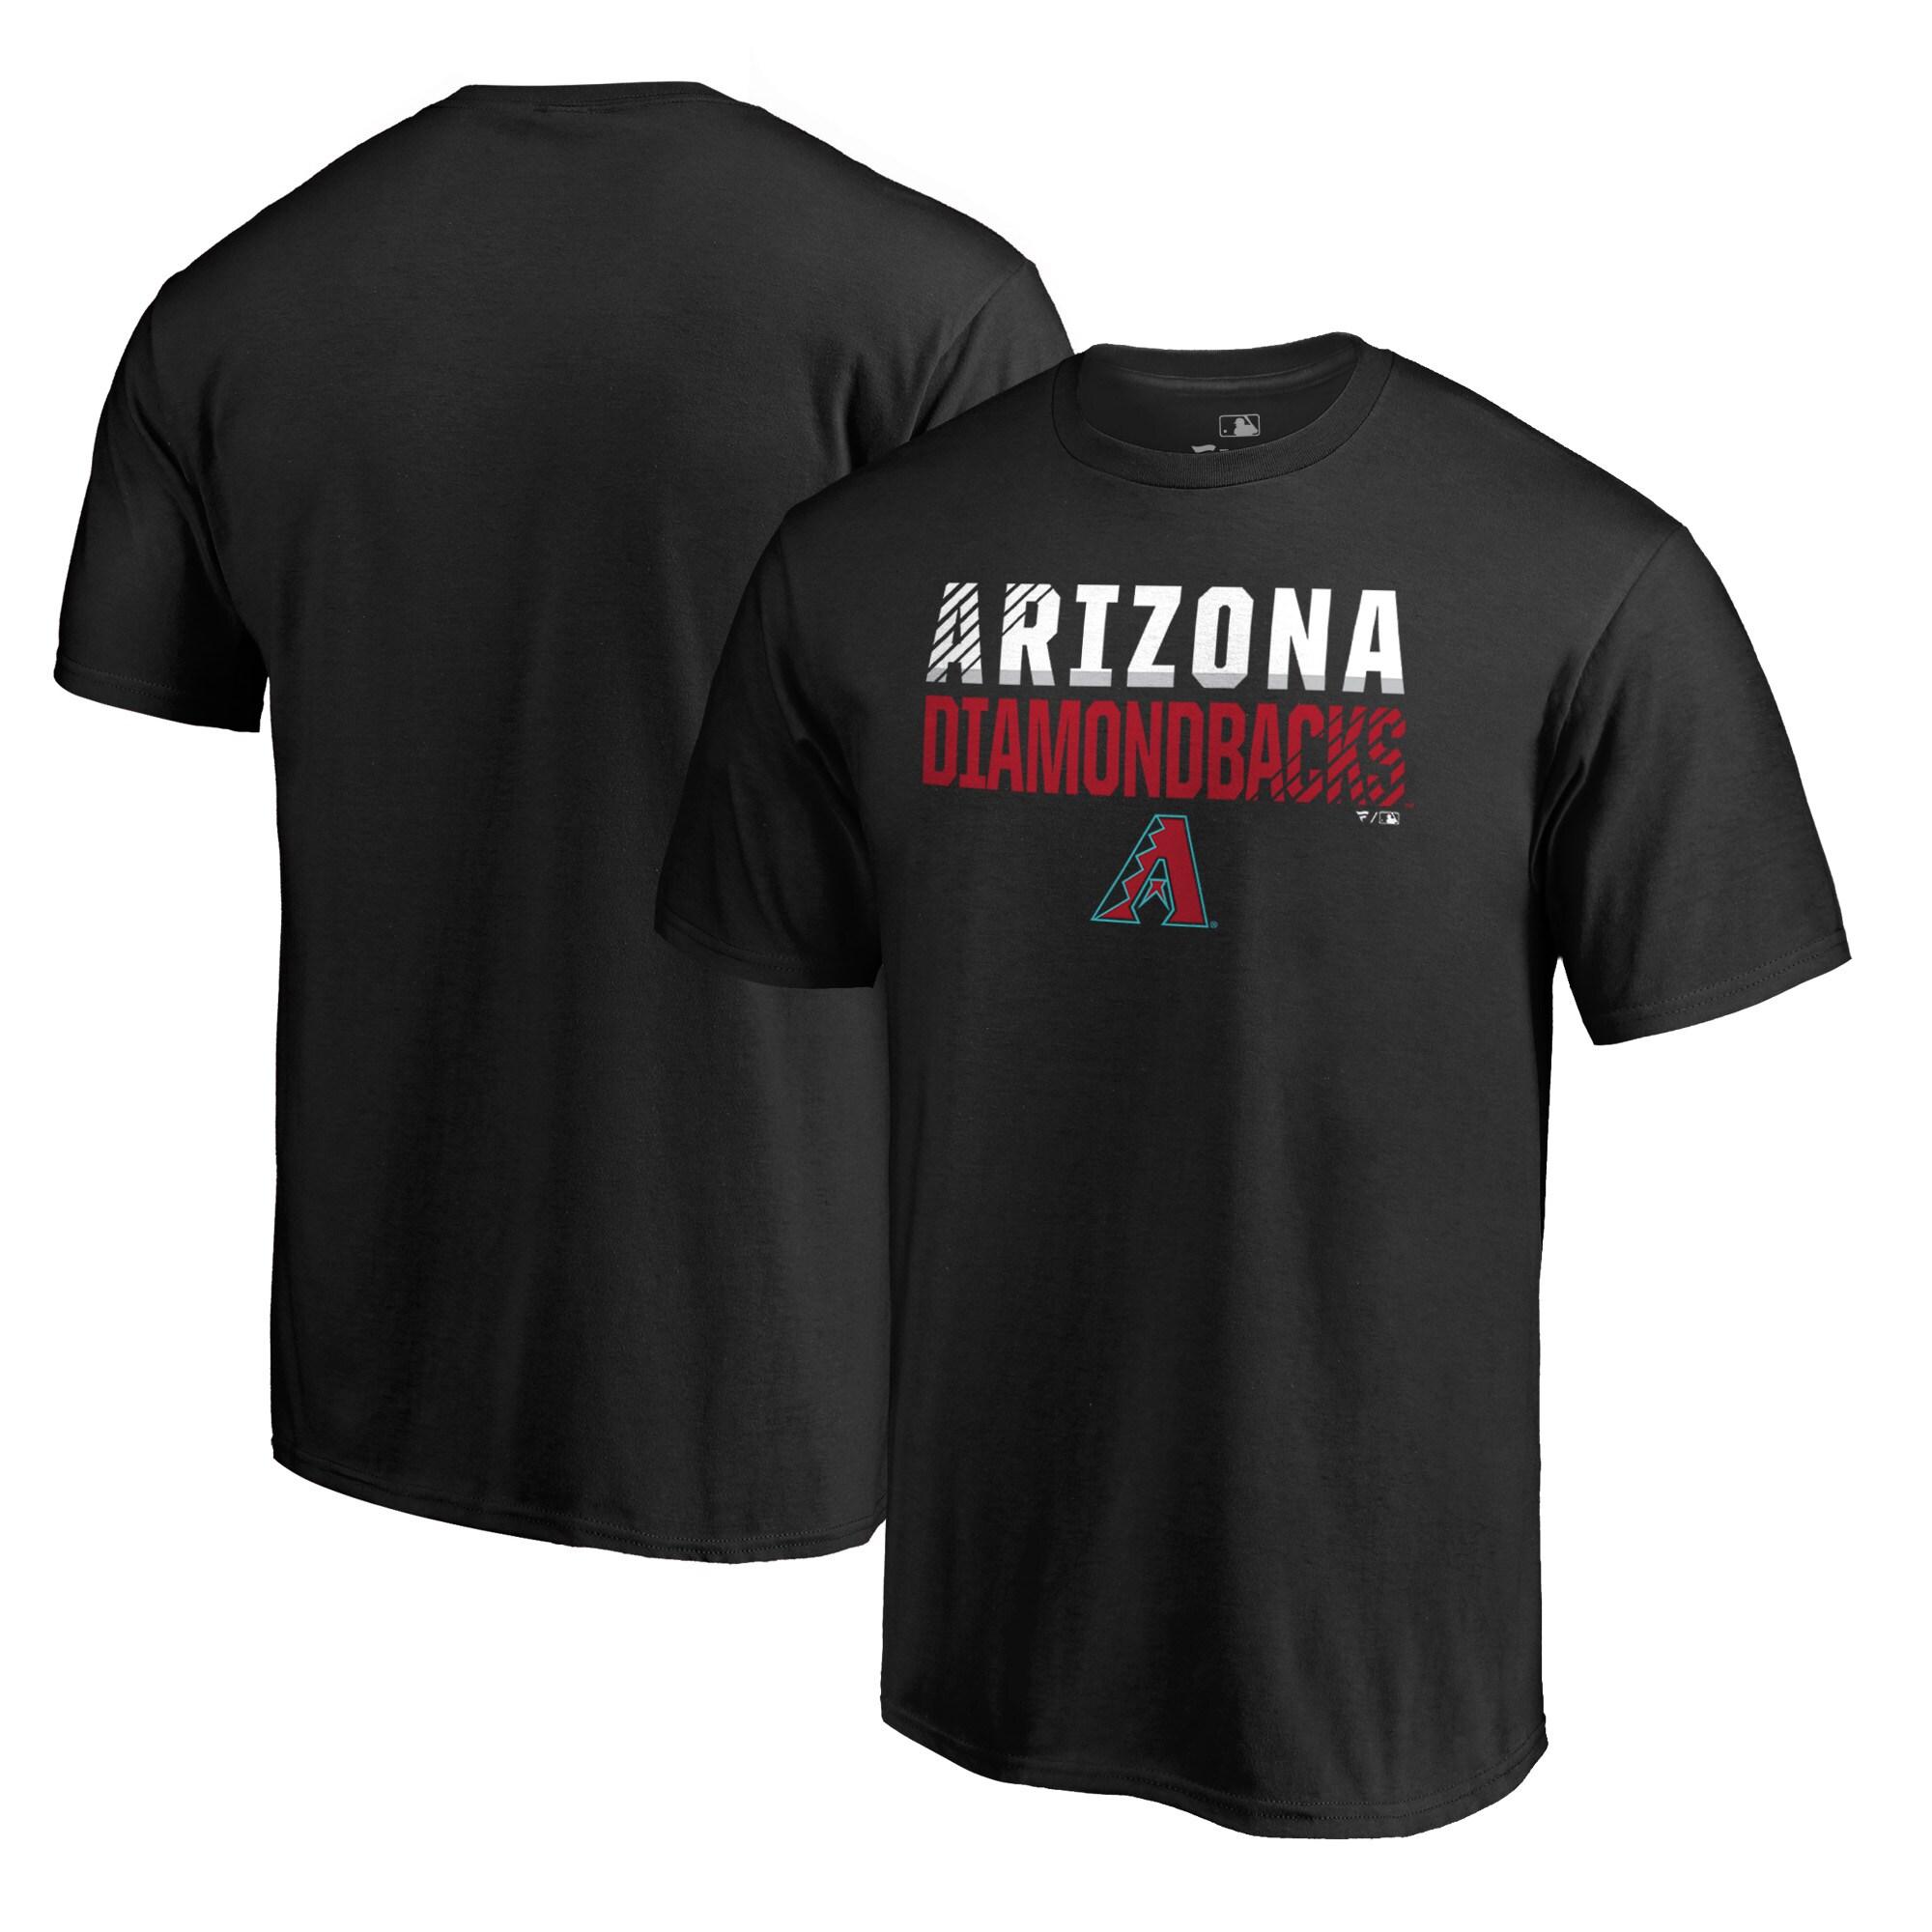 Arizona Diamondbacks Fanatics Branded Fade Out T-Shirt - Black